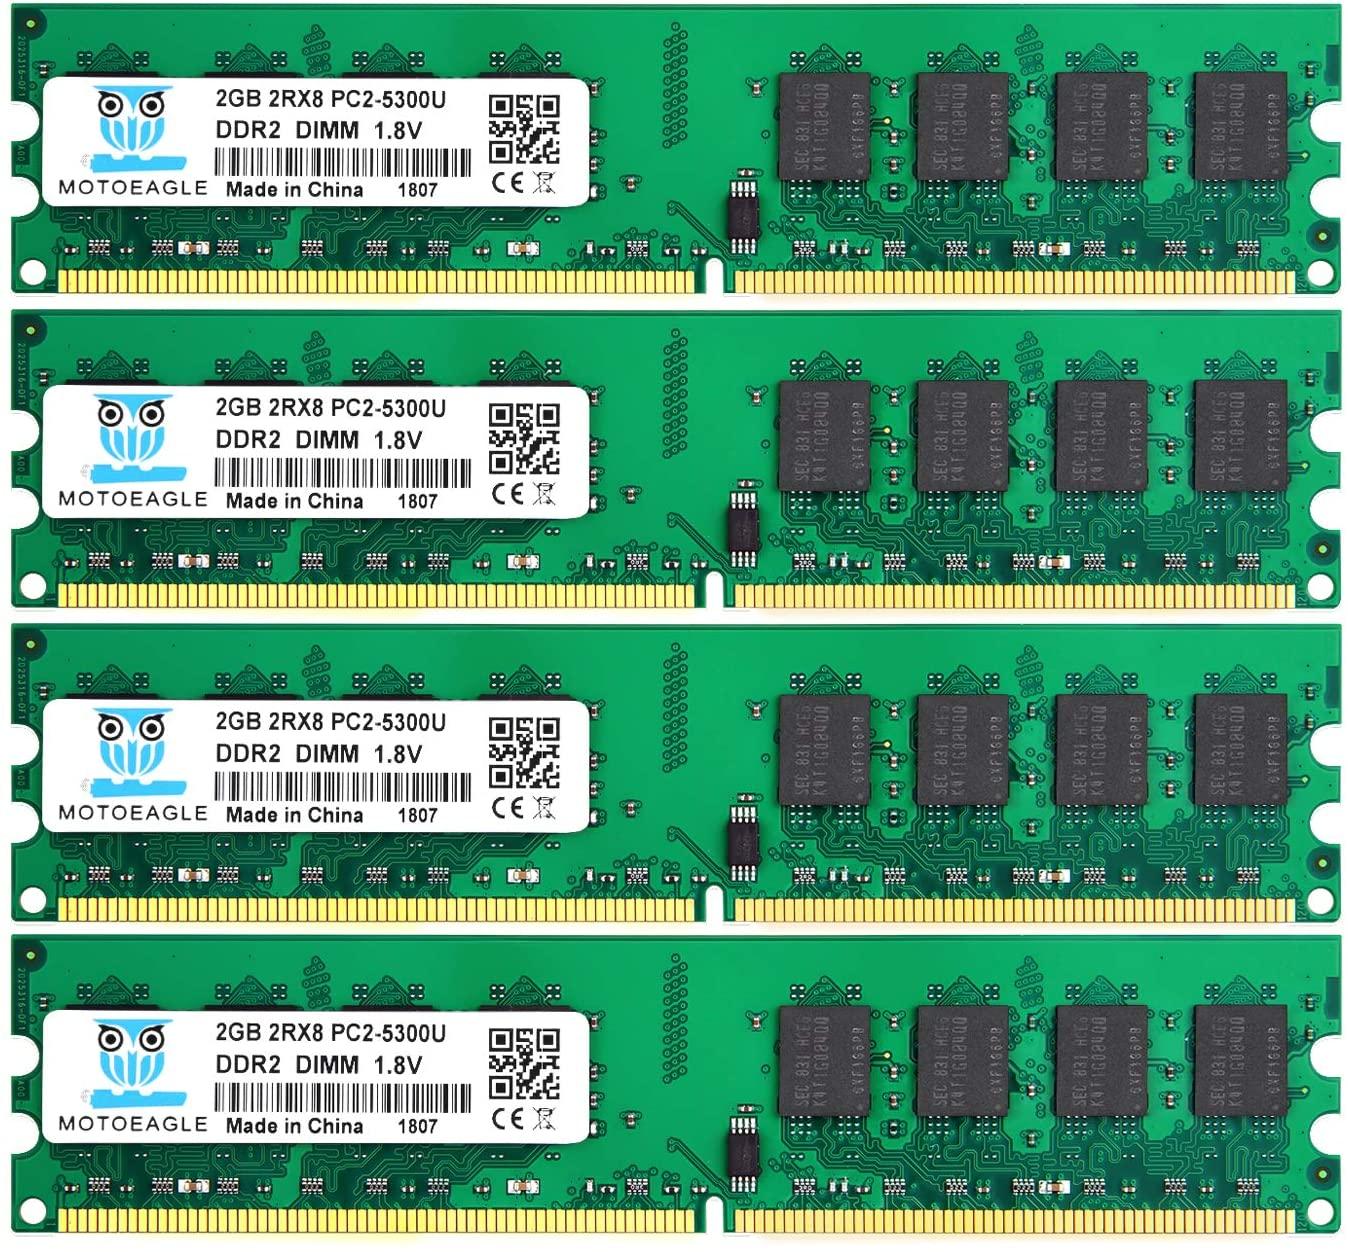 DDR2 PC2 5300 667 MHz Udimm RAM, Motoeagle 8GB Kit (2GBX4) PC2 5300U 1.8V Unbuffered Desktop Memory Modules